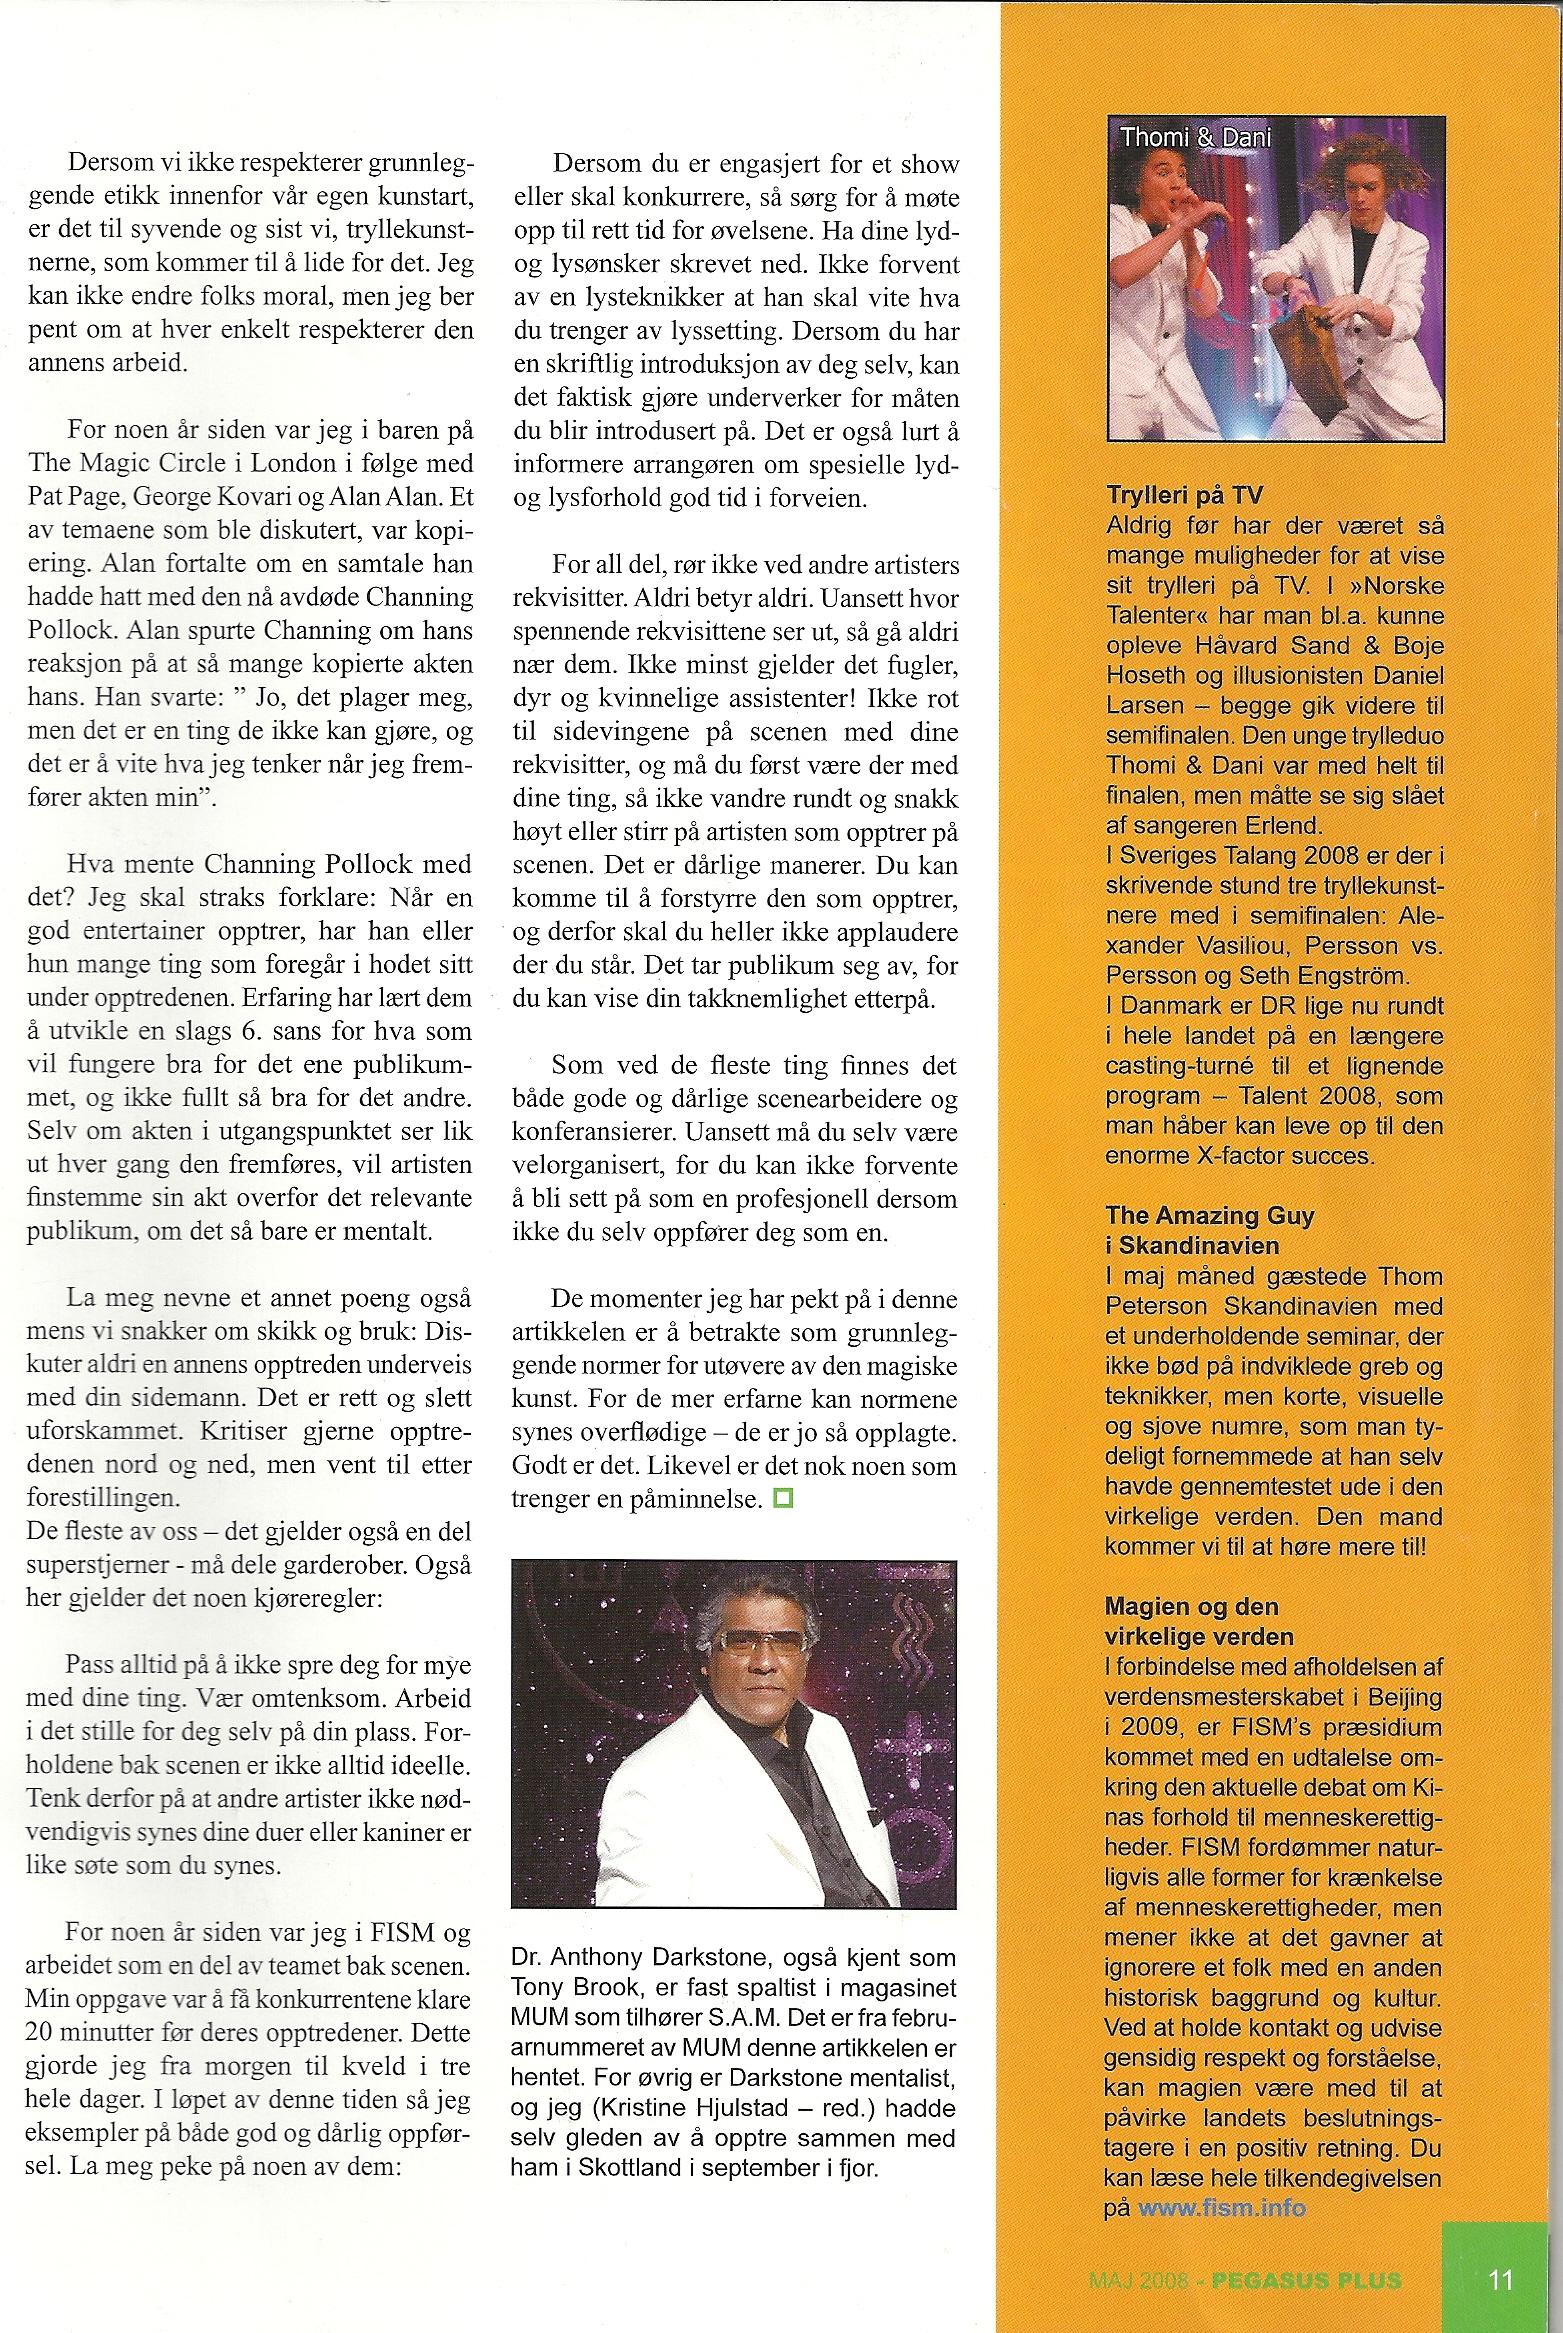 Pegasus Magic Magazine May 2008 Dr Anthony Darstone prt 2